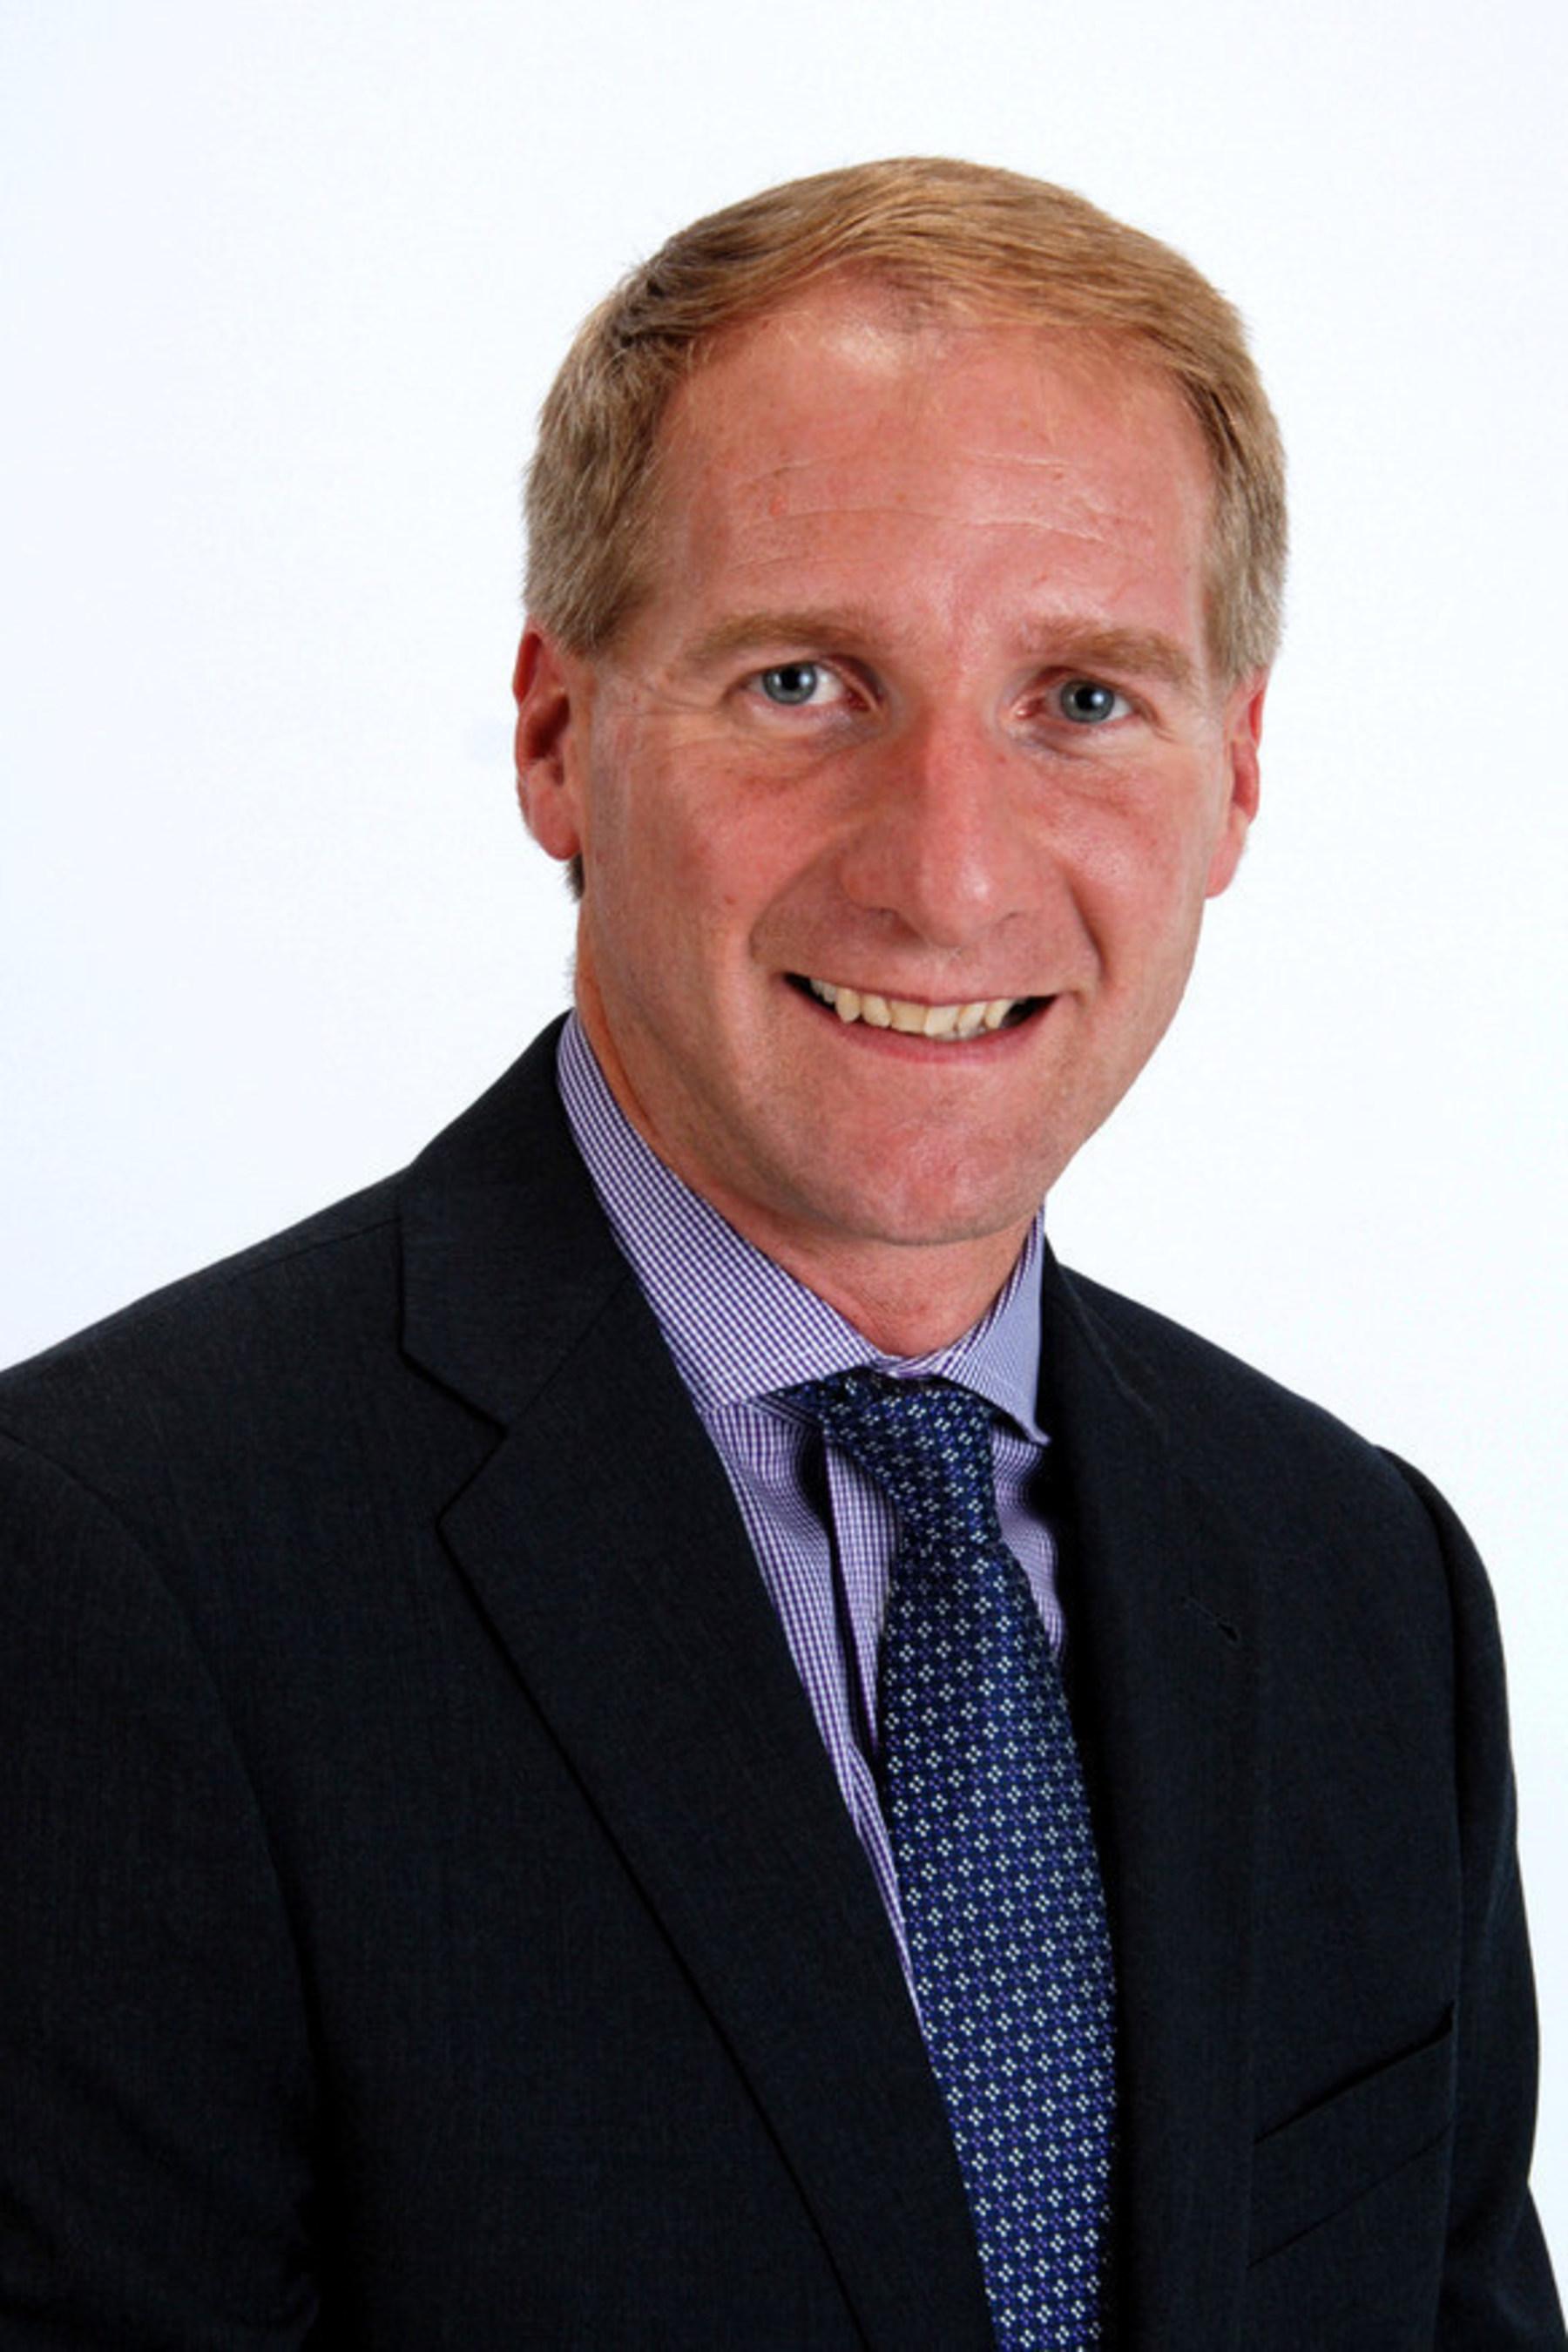 Jason Haddock, Chief Financial Officer, Array BioPharma Inc.